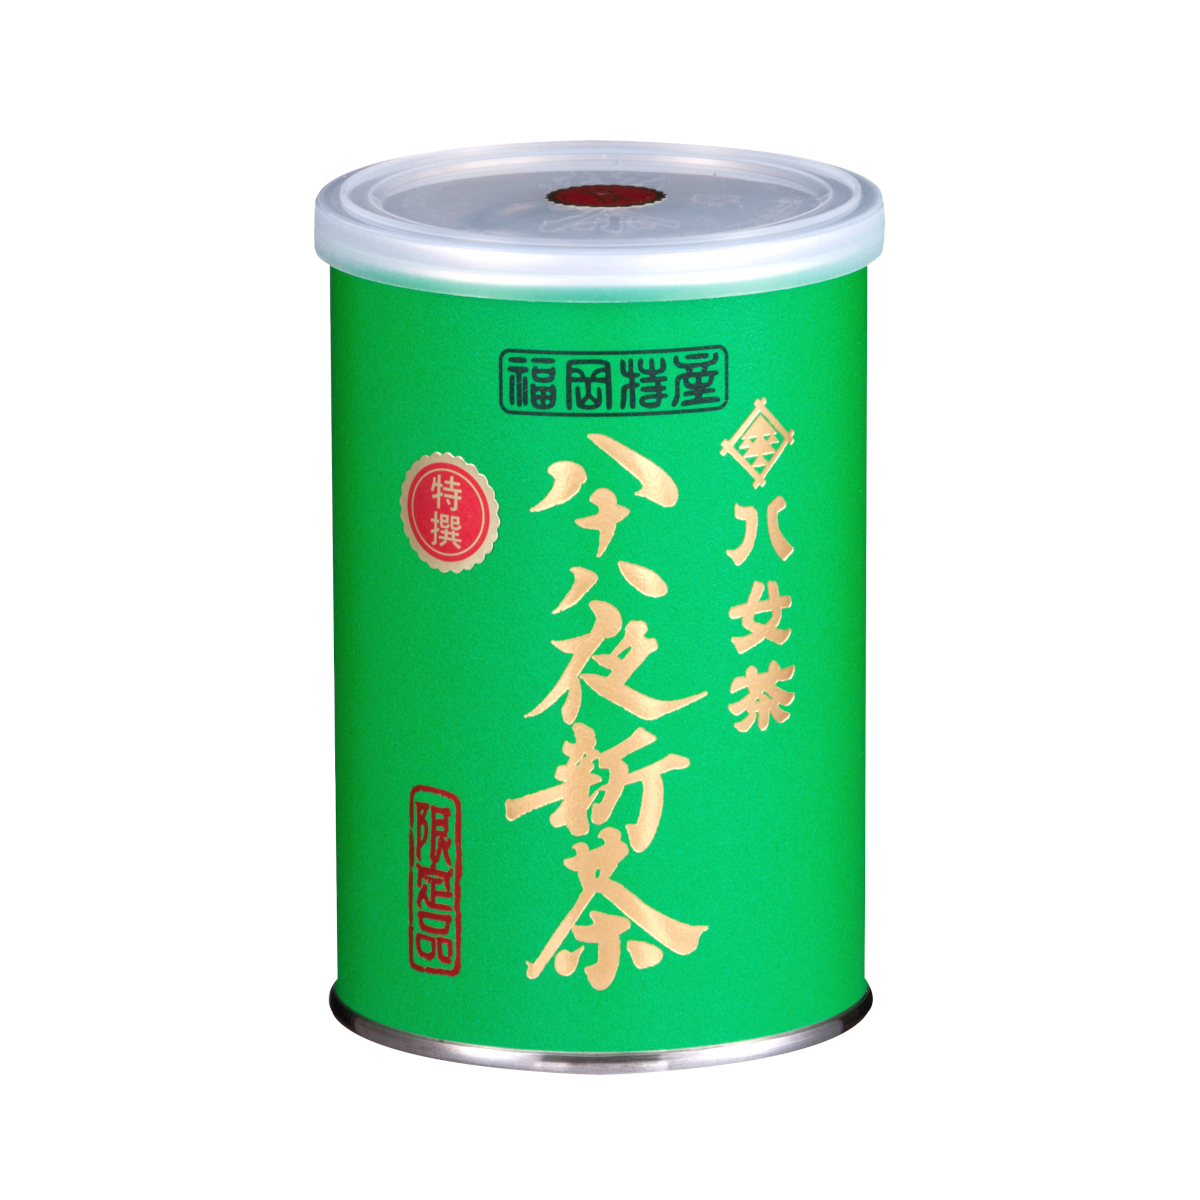 【5・キ】特選八十八夜新茶(缶)